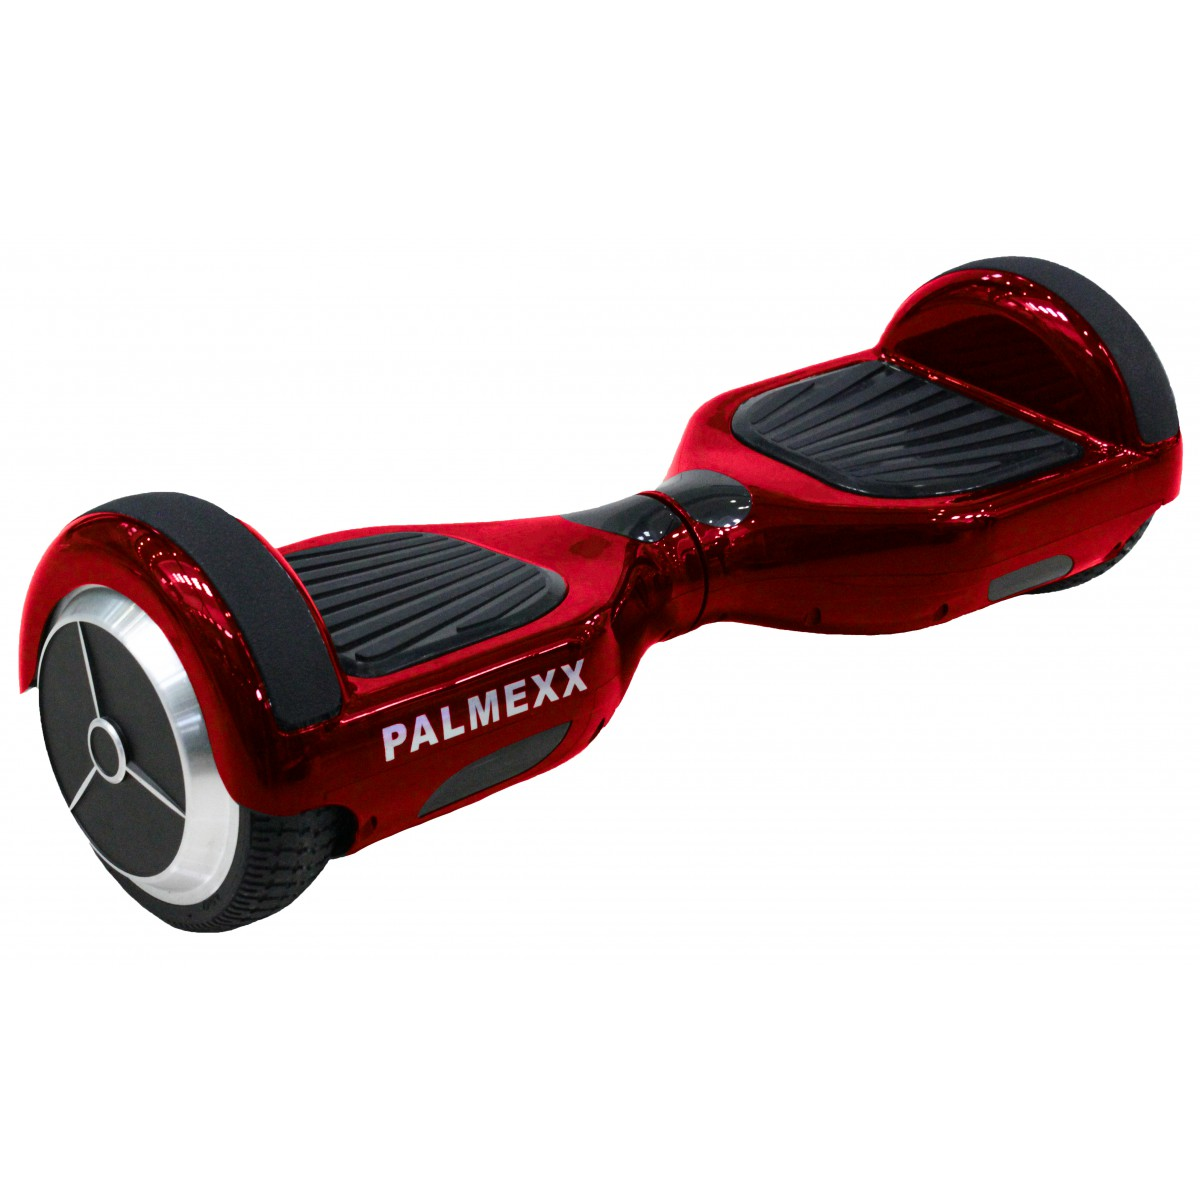 palmexx smart balance wheel. Black Bedroom Furniture Sets. Home Design Ideas